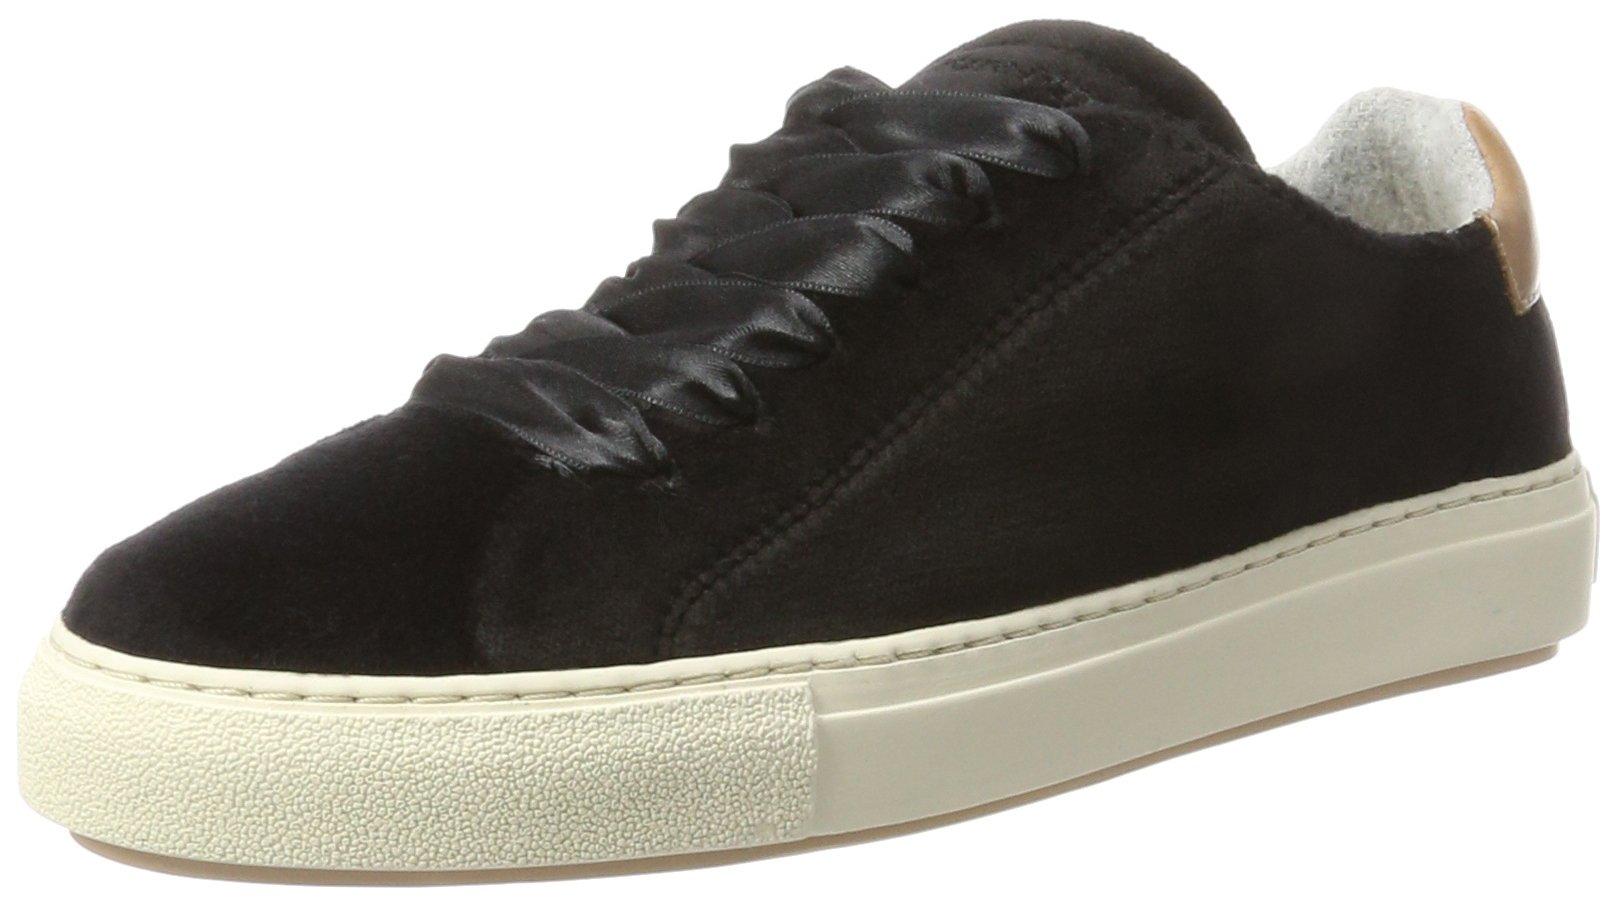 70714053501603Baskets Sneaker Marc O'polo Eu FemmeSchwarzblack37 Kcu53TFJ1l